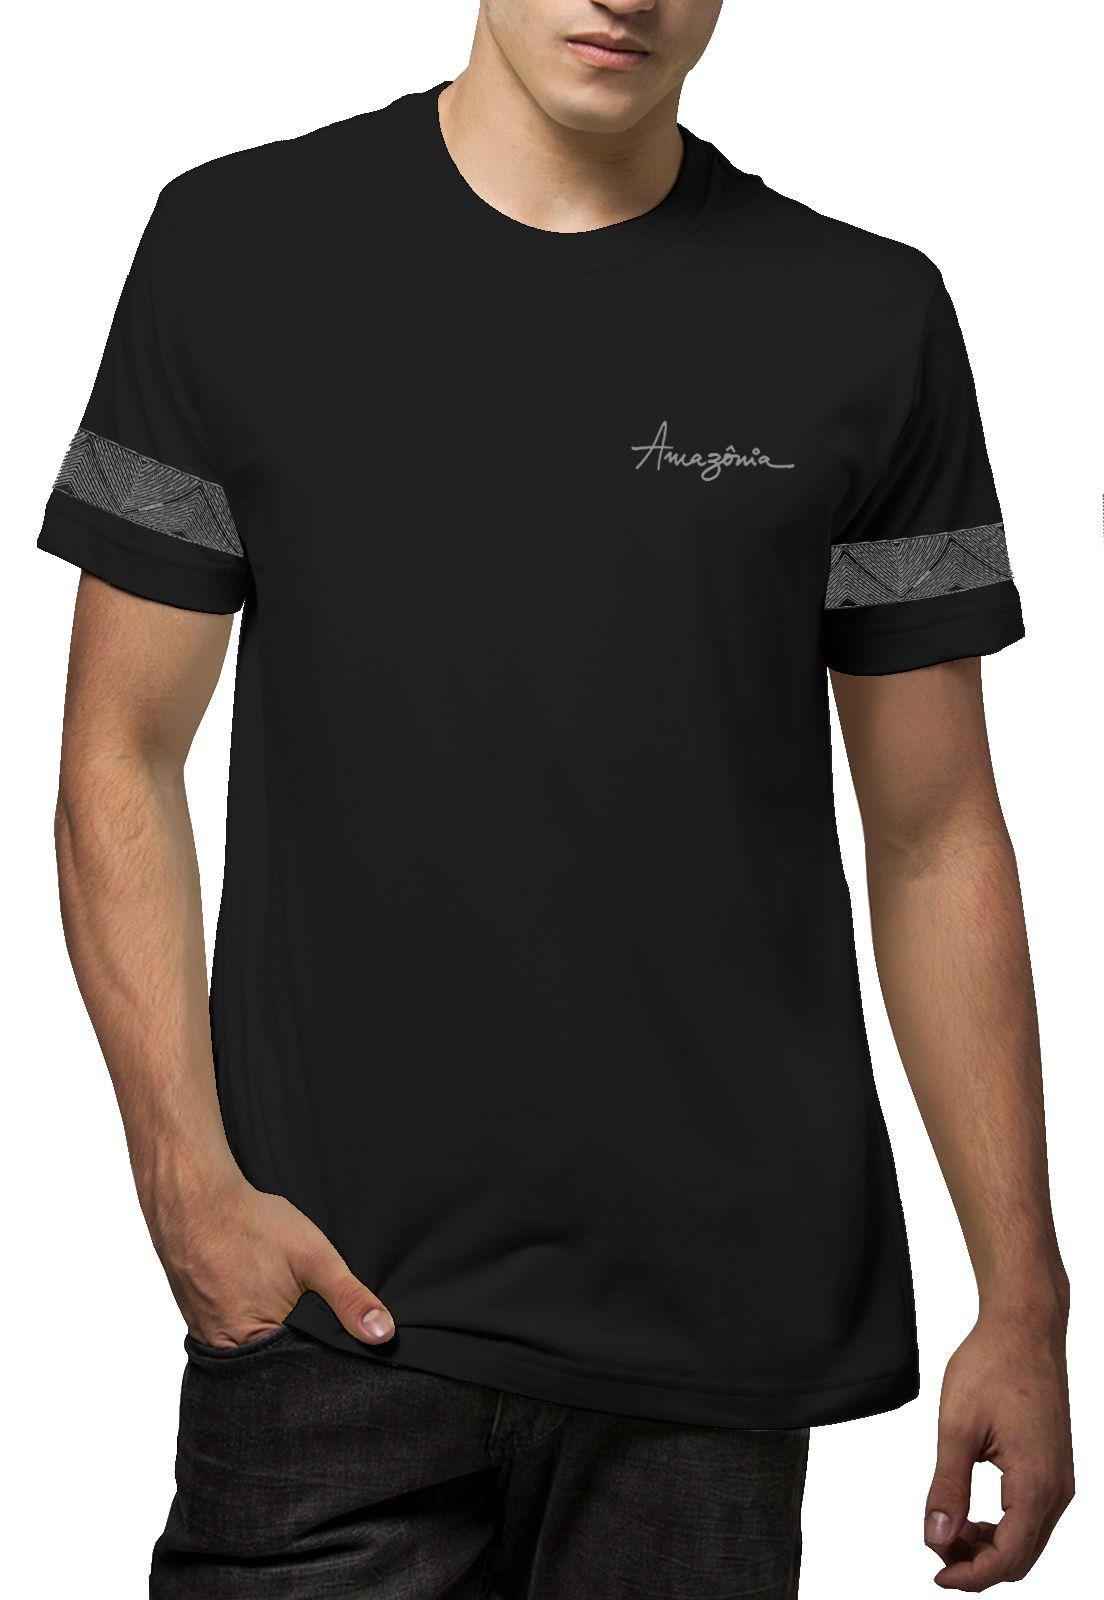 Camiseta Amazônia Tribal Braço - Preto